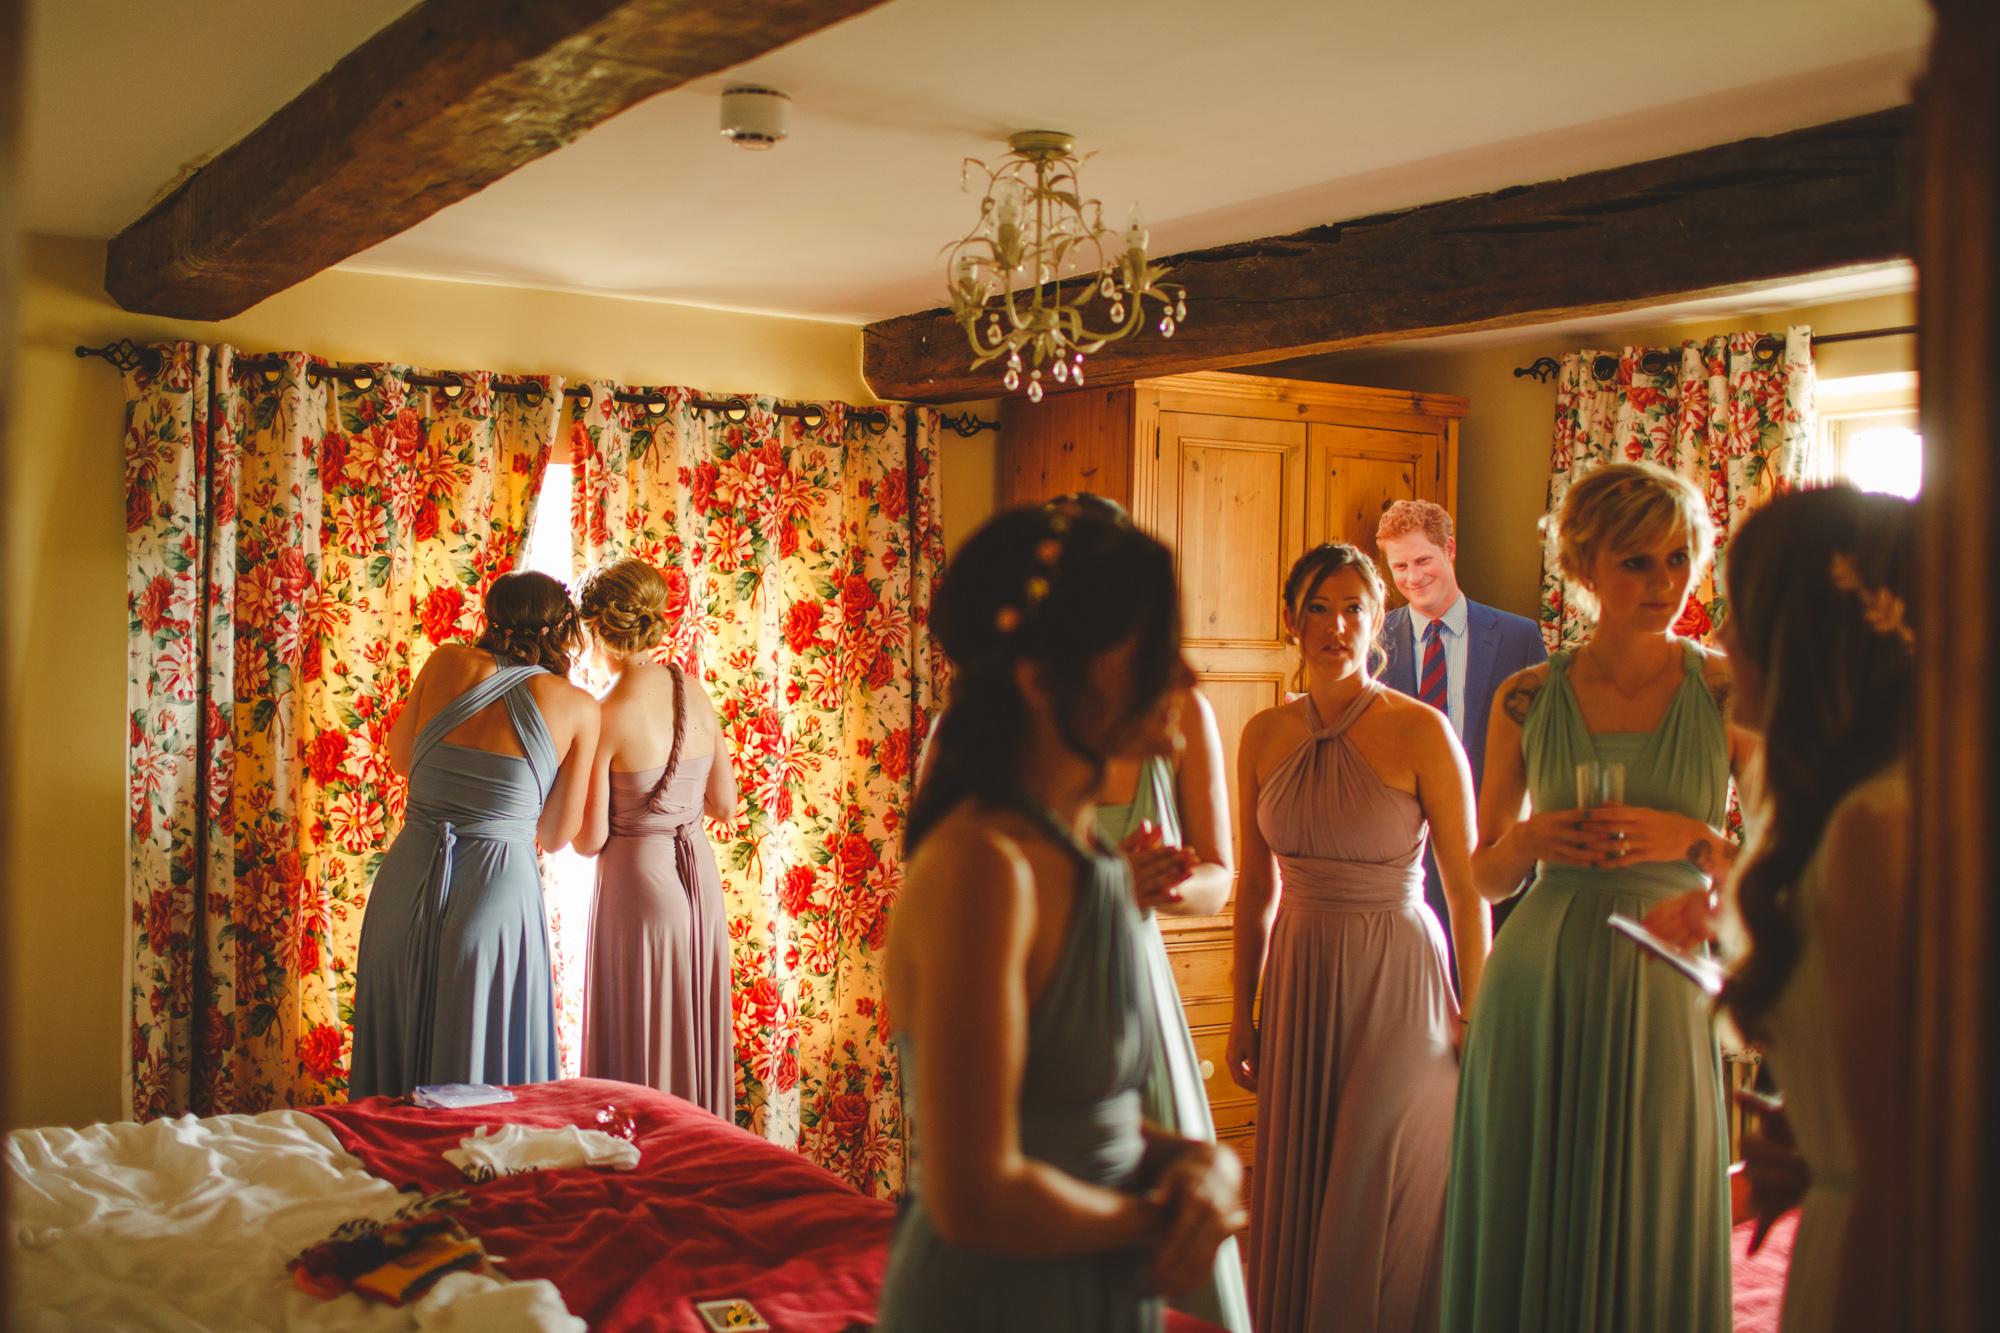 derbyshire-wedding-photographer-filmmaker-carsington-water--3.jpg